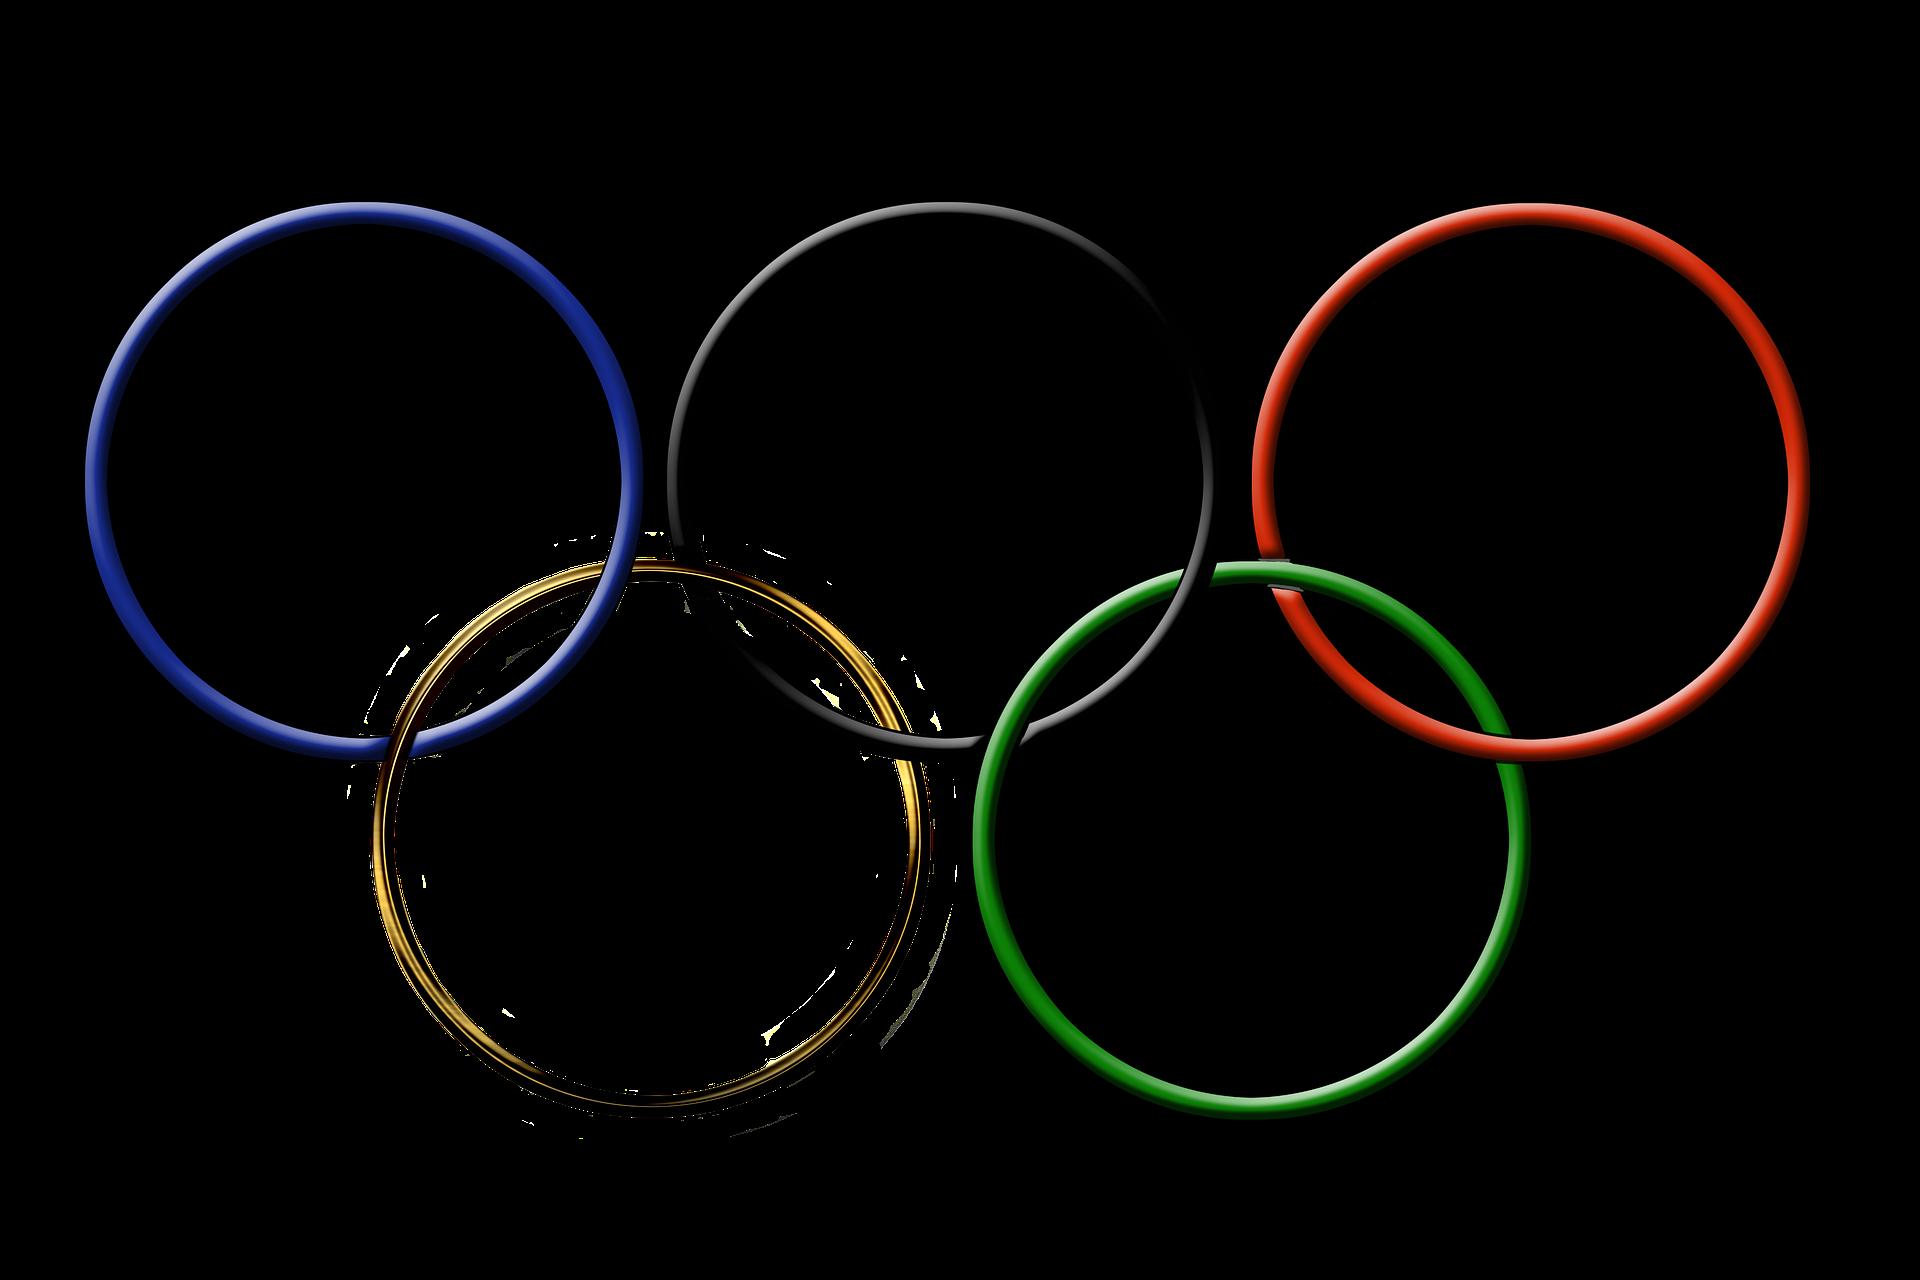 Olympics medal winner happiness